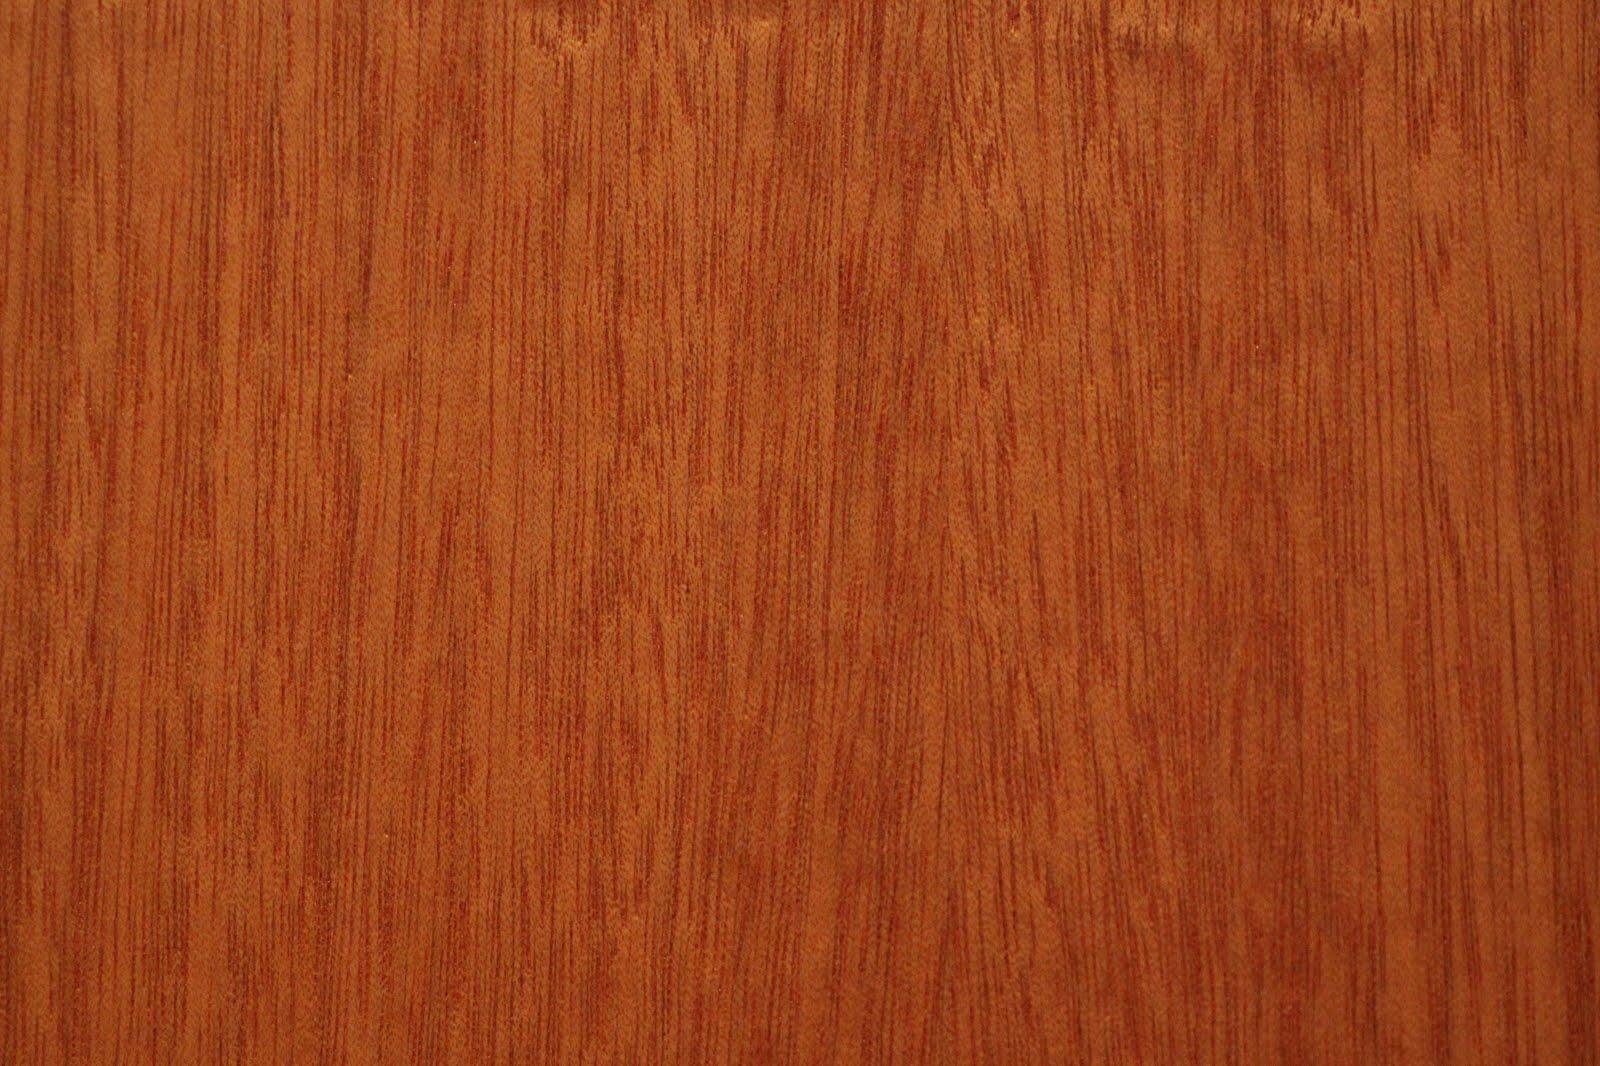 Etiketter: Wood Textures